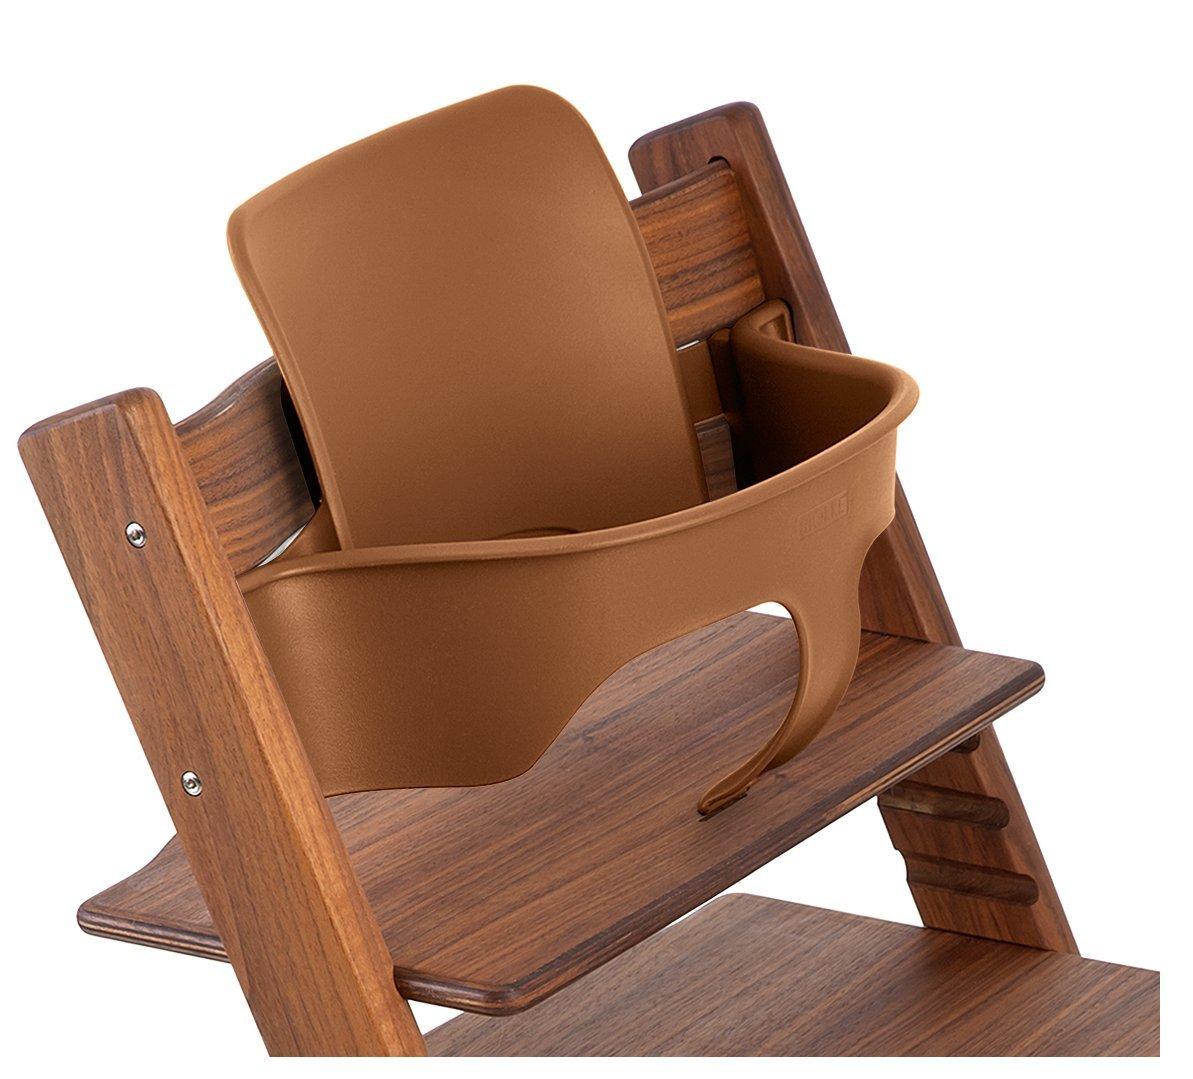 Amazon.com: Stokke, juego para silla para bebé, Café ...